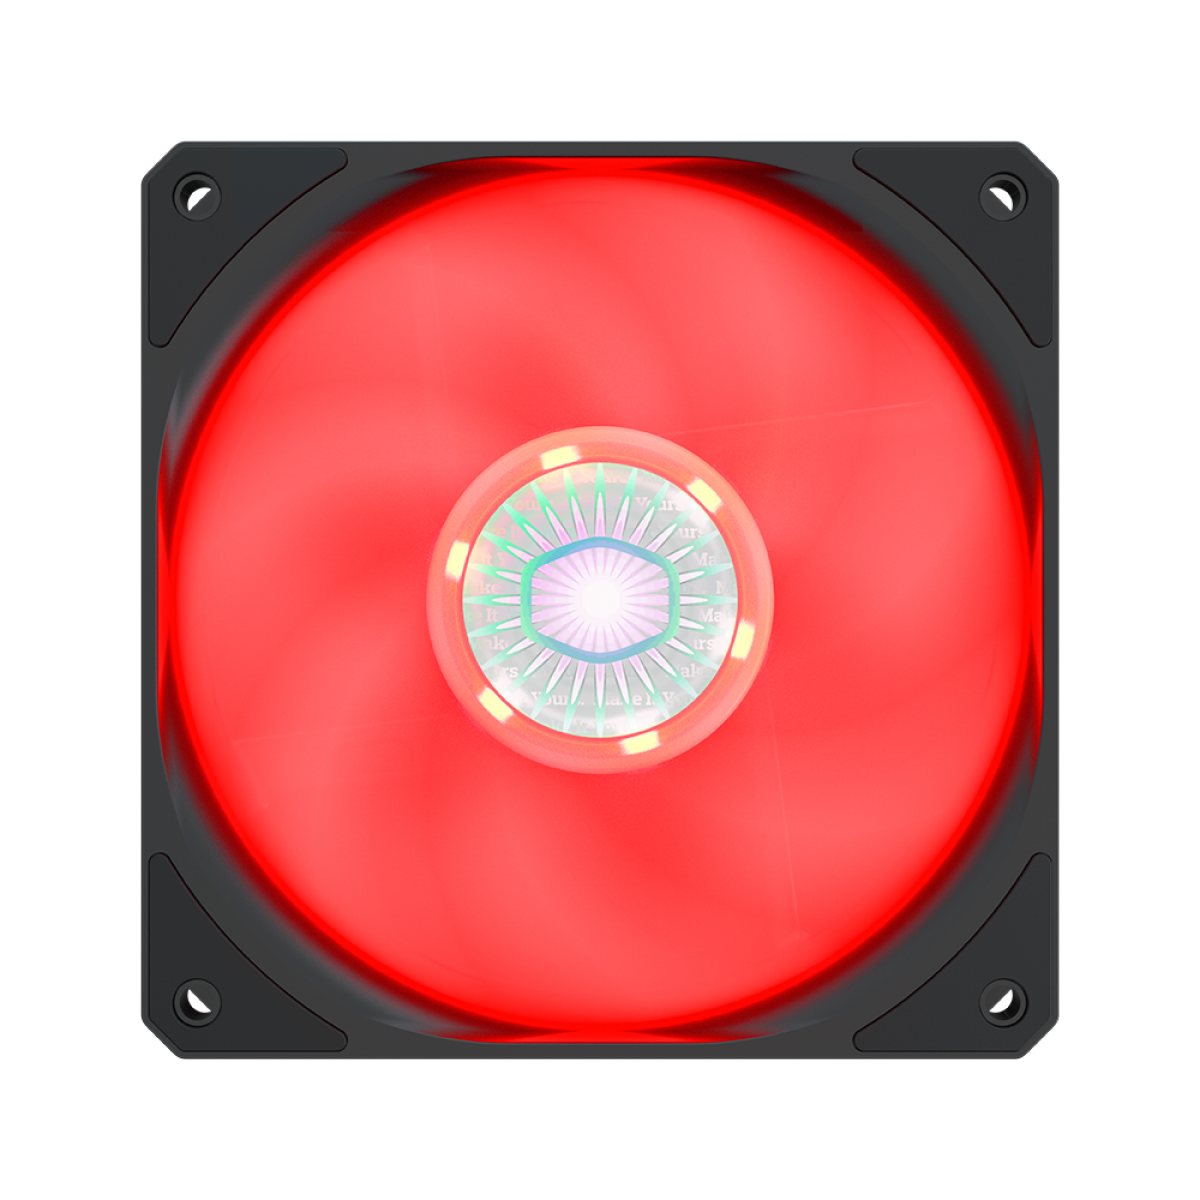 Cooler para Gabinete, Cooler Master, SickleFlow MasterFan MF120 Halo, Red, 120mm, 1800RPM, MFX-B2DN-18NPR-R1